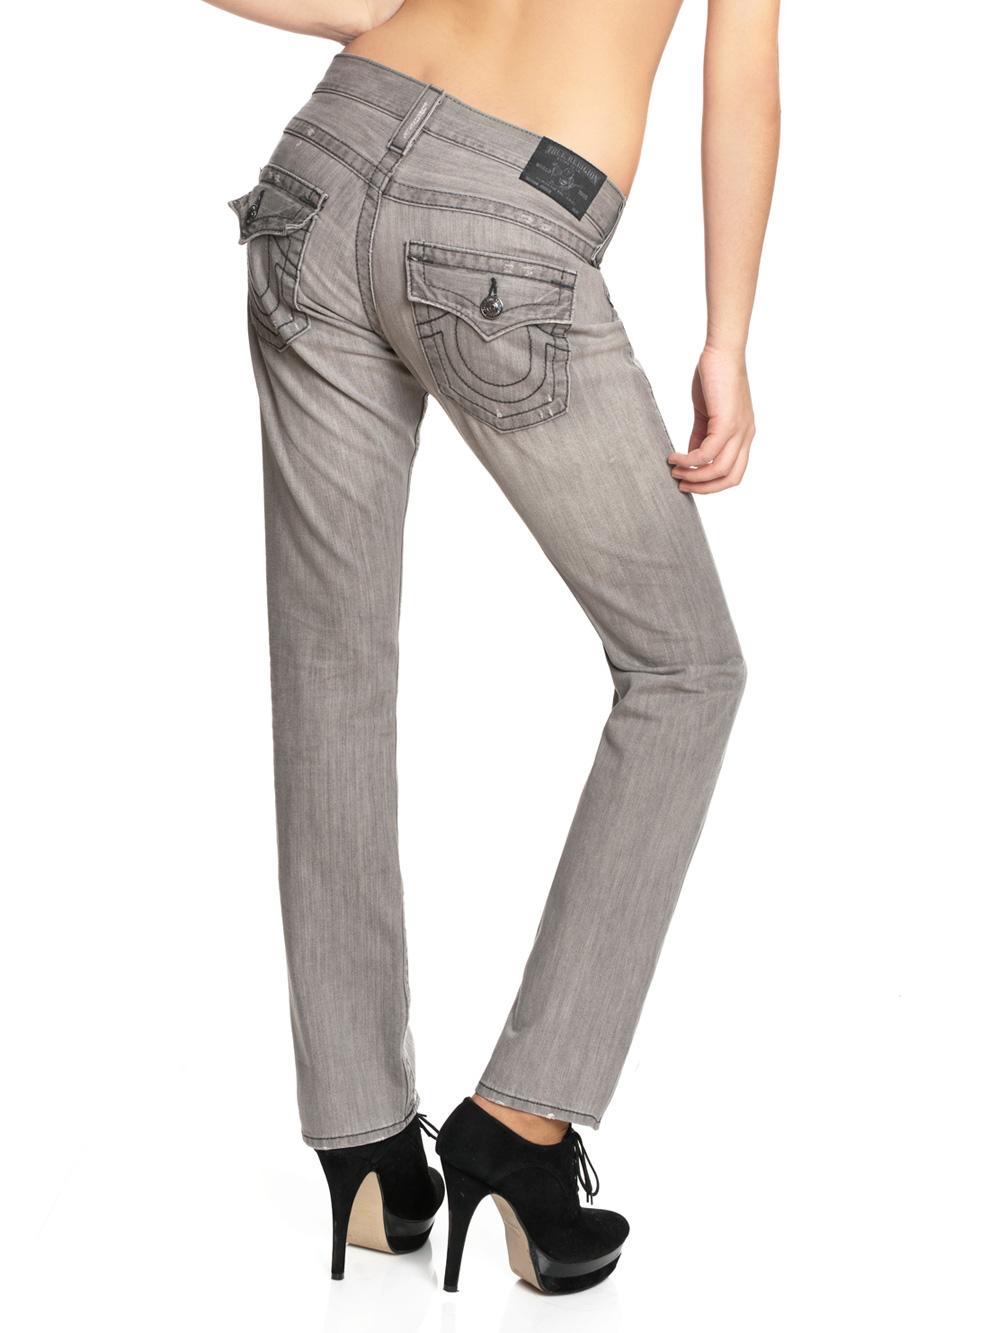 true religion damen jeans jordan straight wagoneer neu ebay. Black Bedroom Furniture Sets. Home Design Ideas